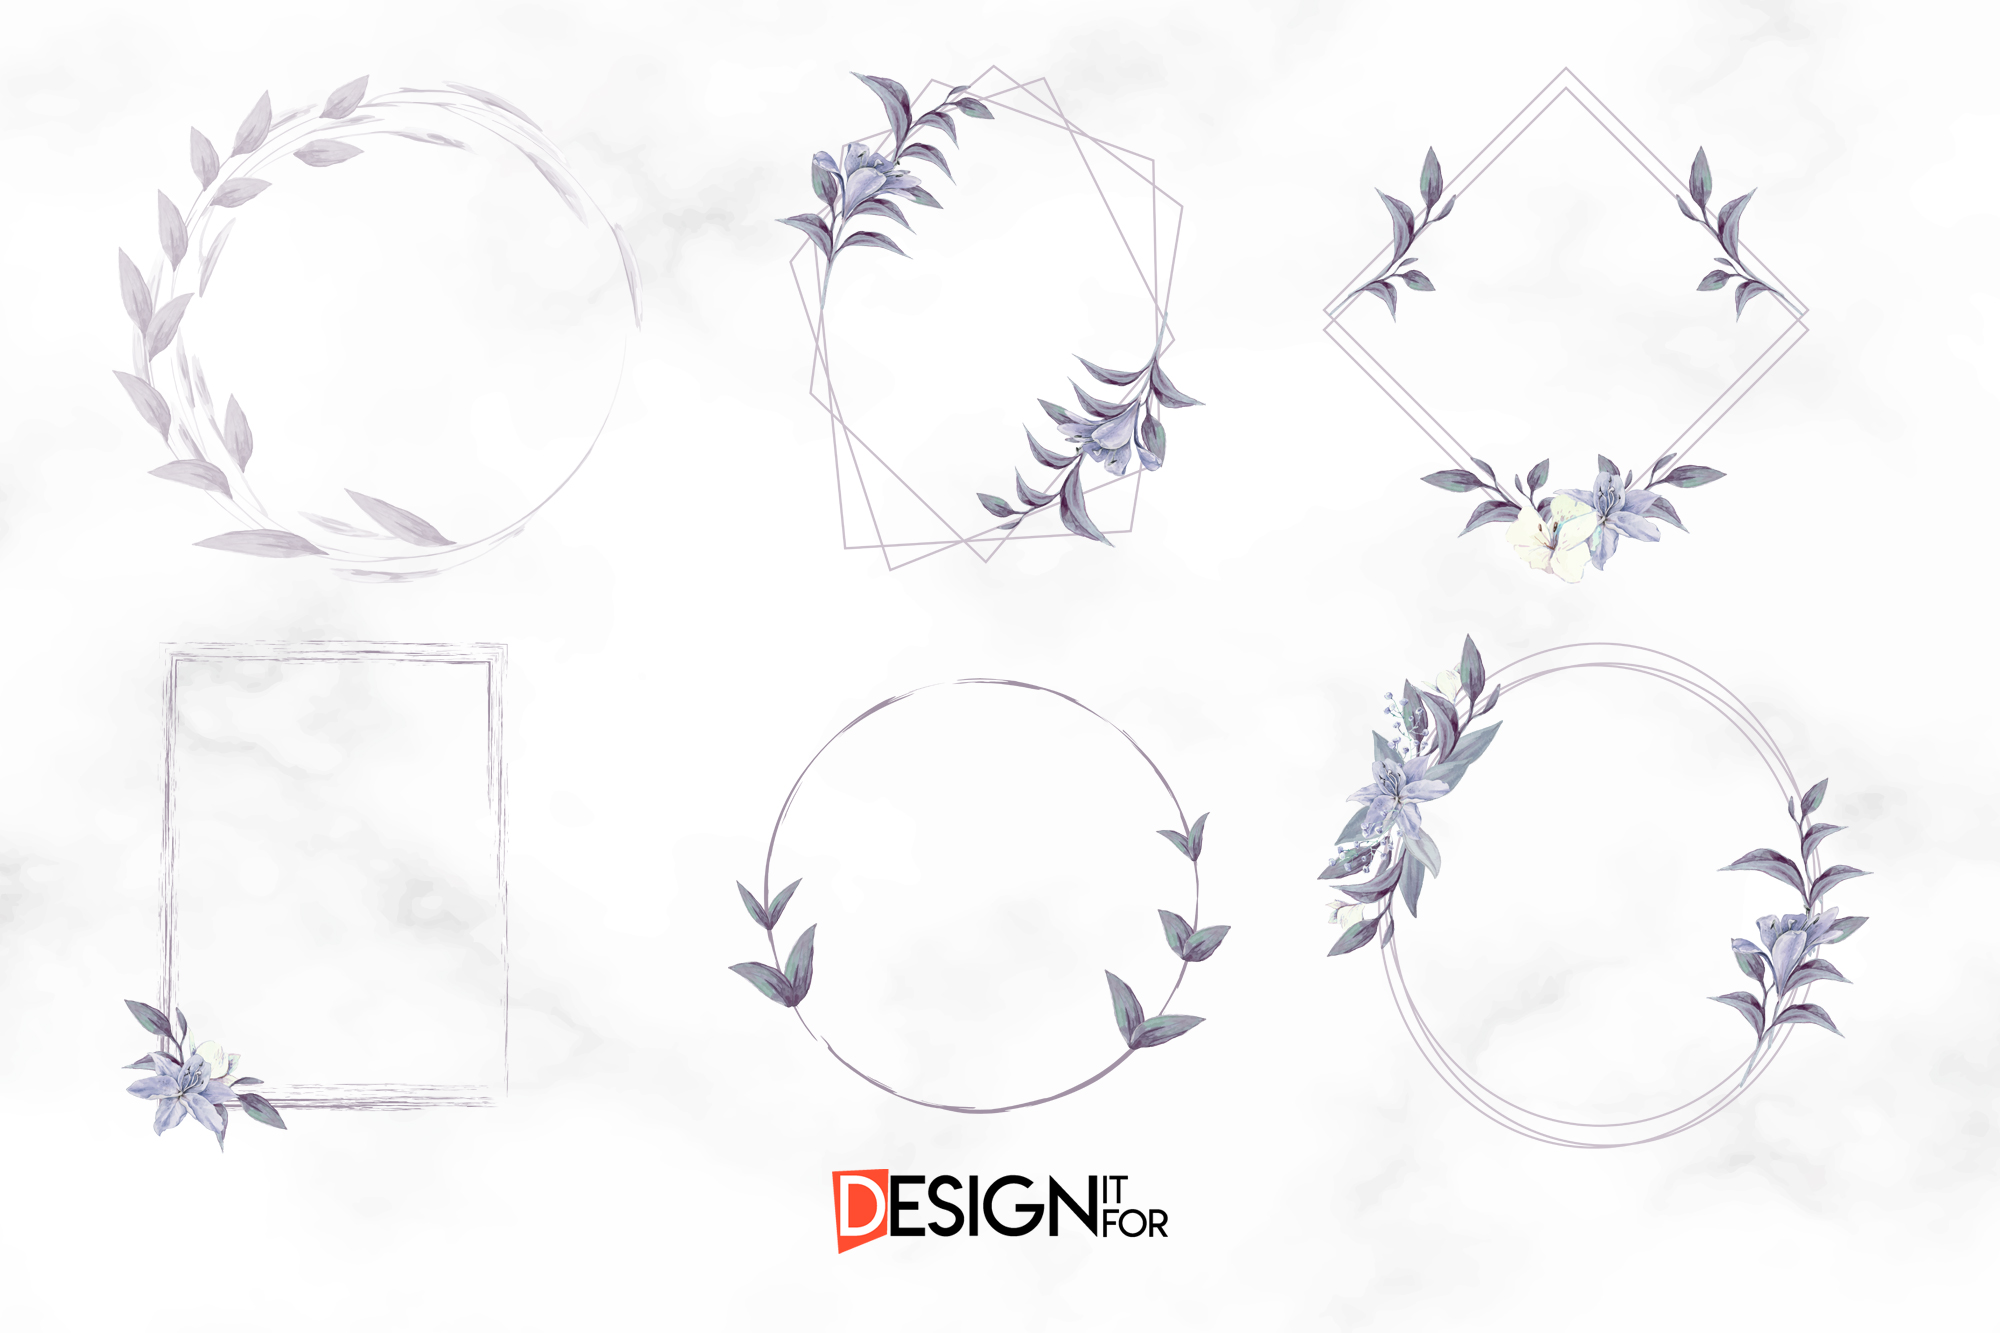 Floral Frame Clipart, Laurel Wreath, clip art, scrapbooking example image 3